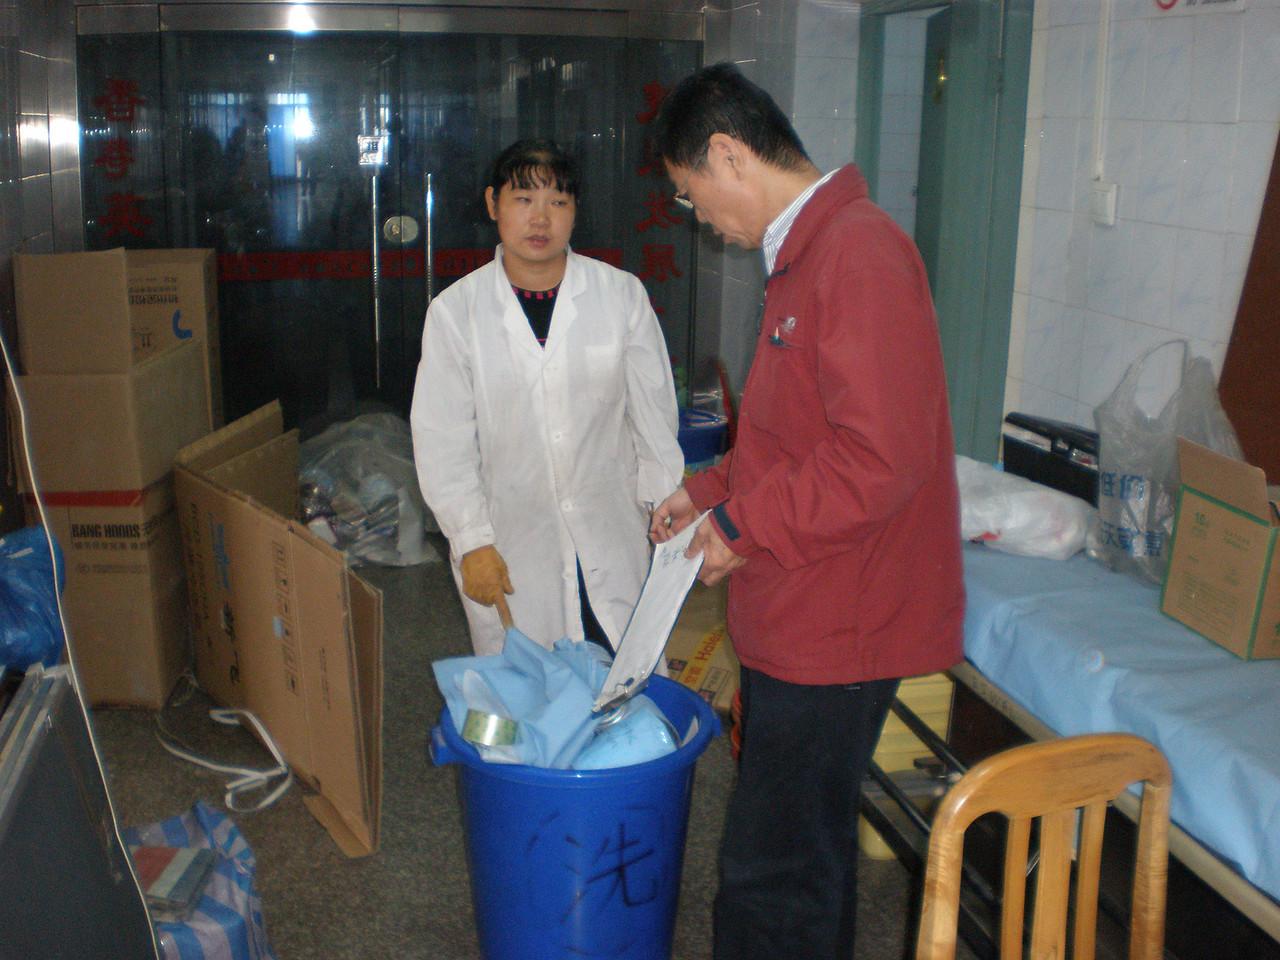 20081015_015 But it won't fit inside this bin.